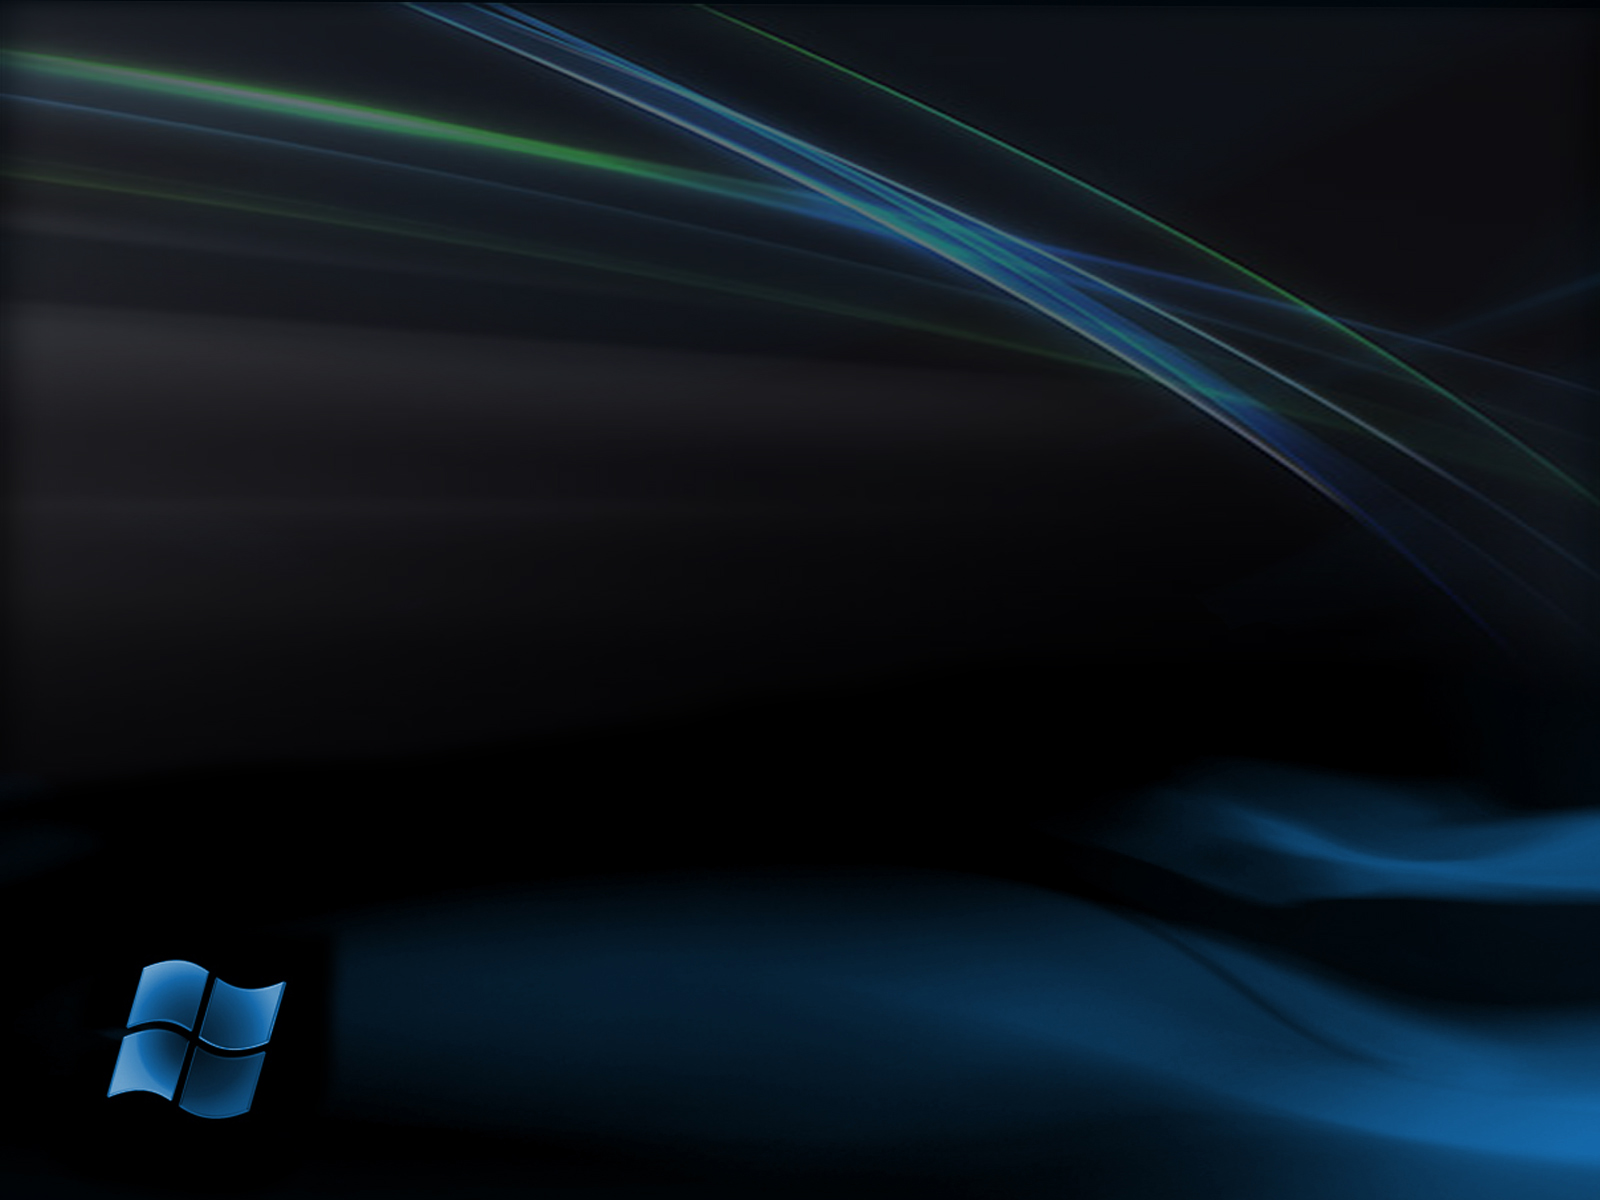 Free download Wallpaper Windows 7 3d 77 HD Desktop